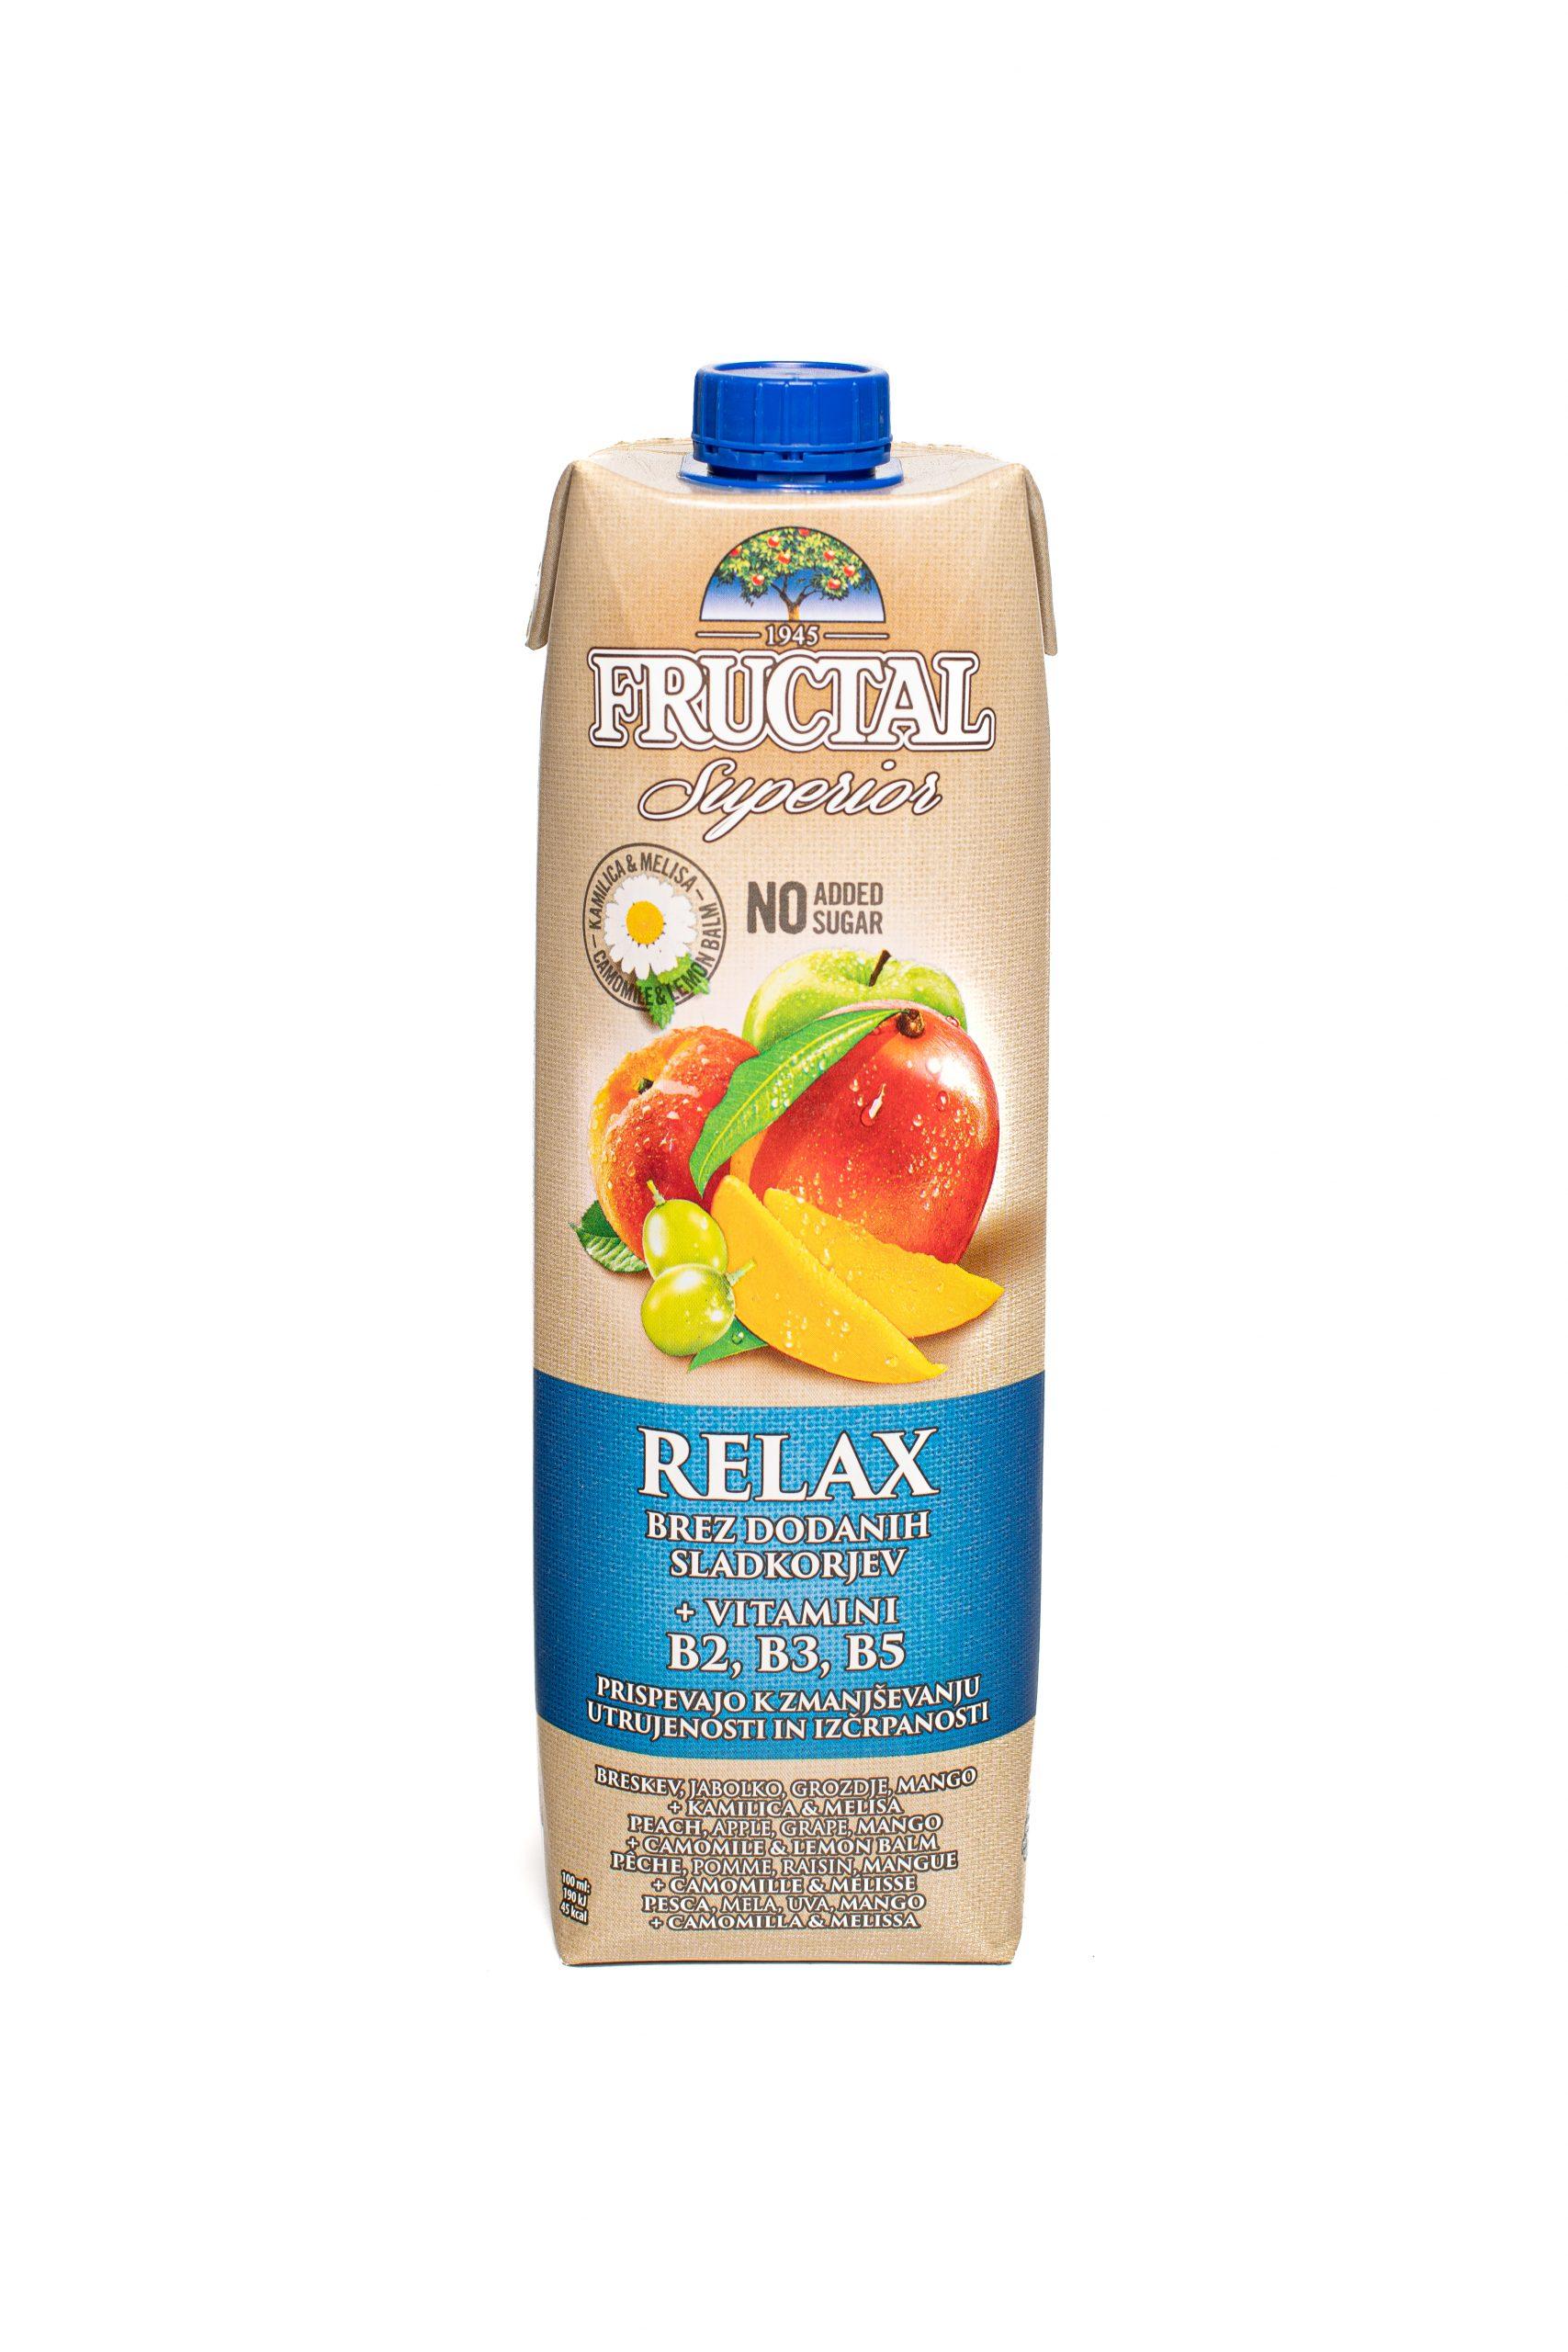 Fructal Superior Organic | 1L | No Sugar Added | Relax